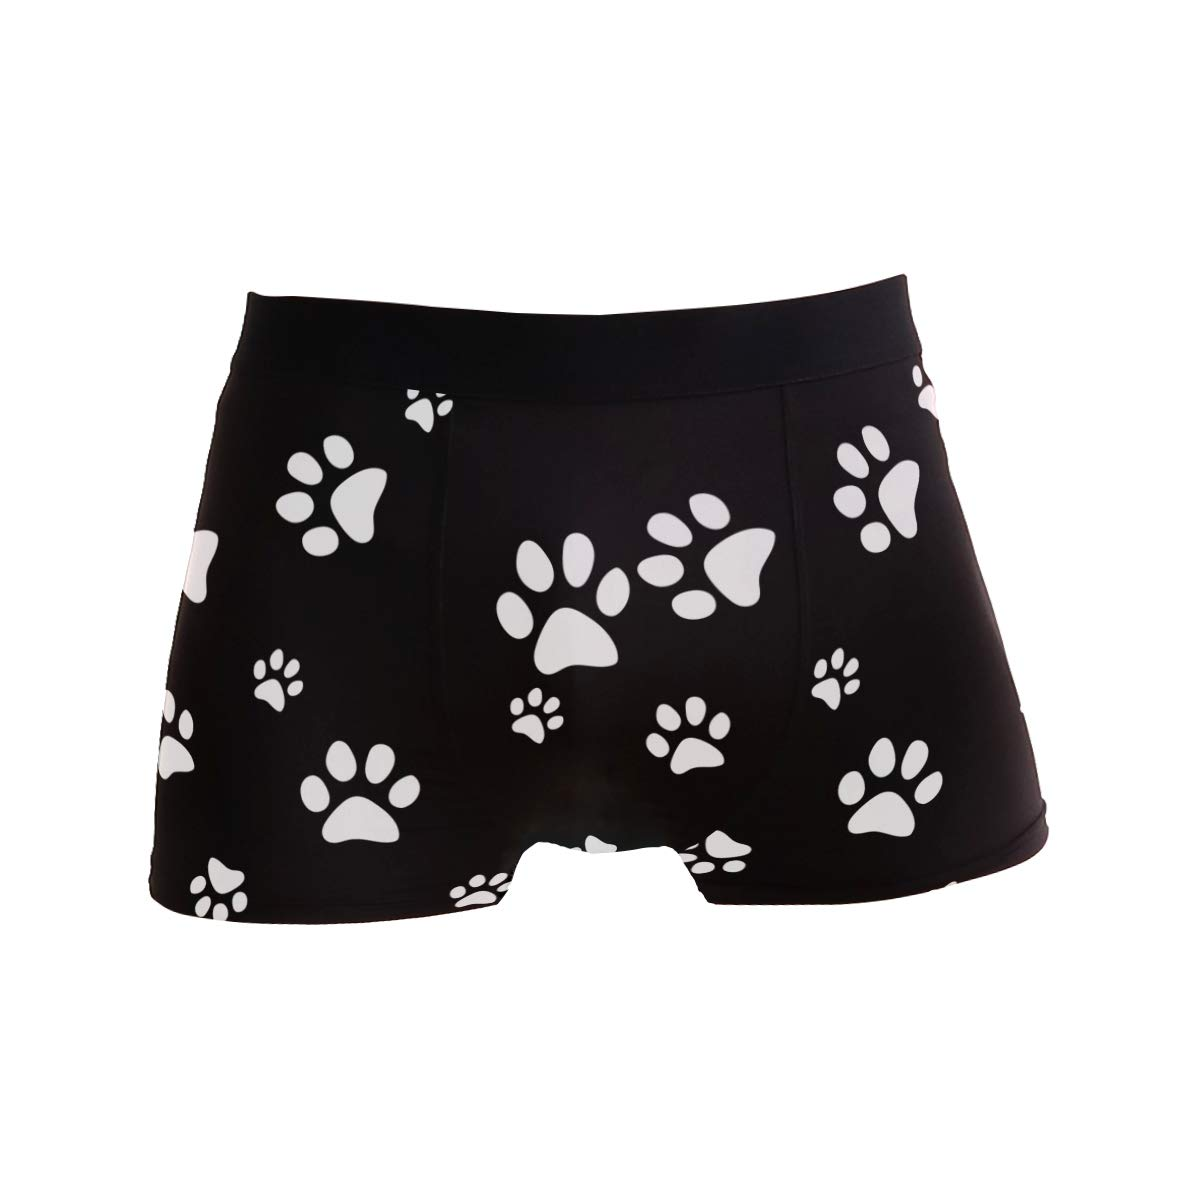 BETTKEN Mens Boxer Briefs Animal Puppy Dog Paw Print Short Underwear Soft Stretch Underpants for Men Boys S-XL